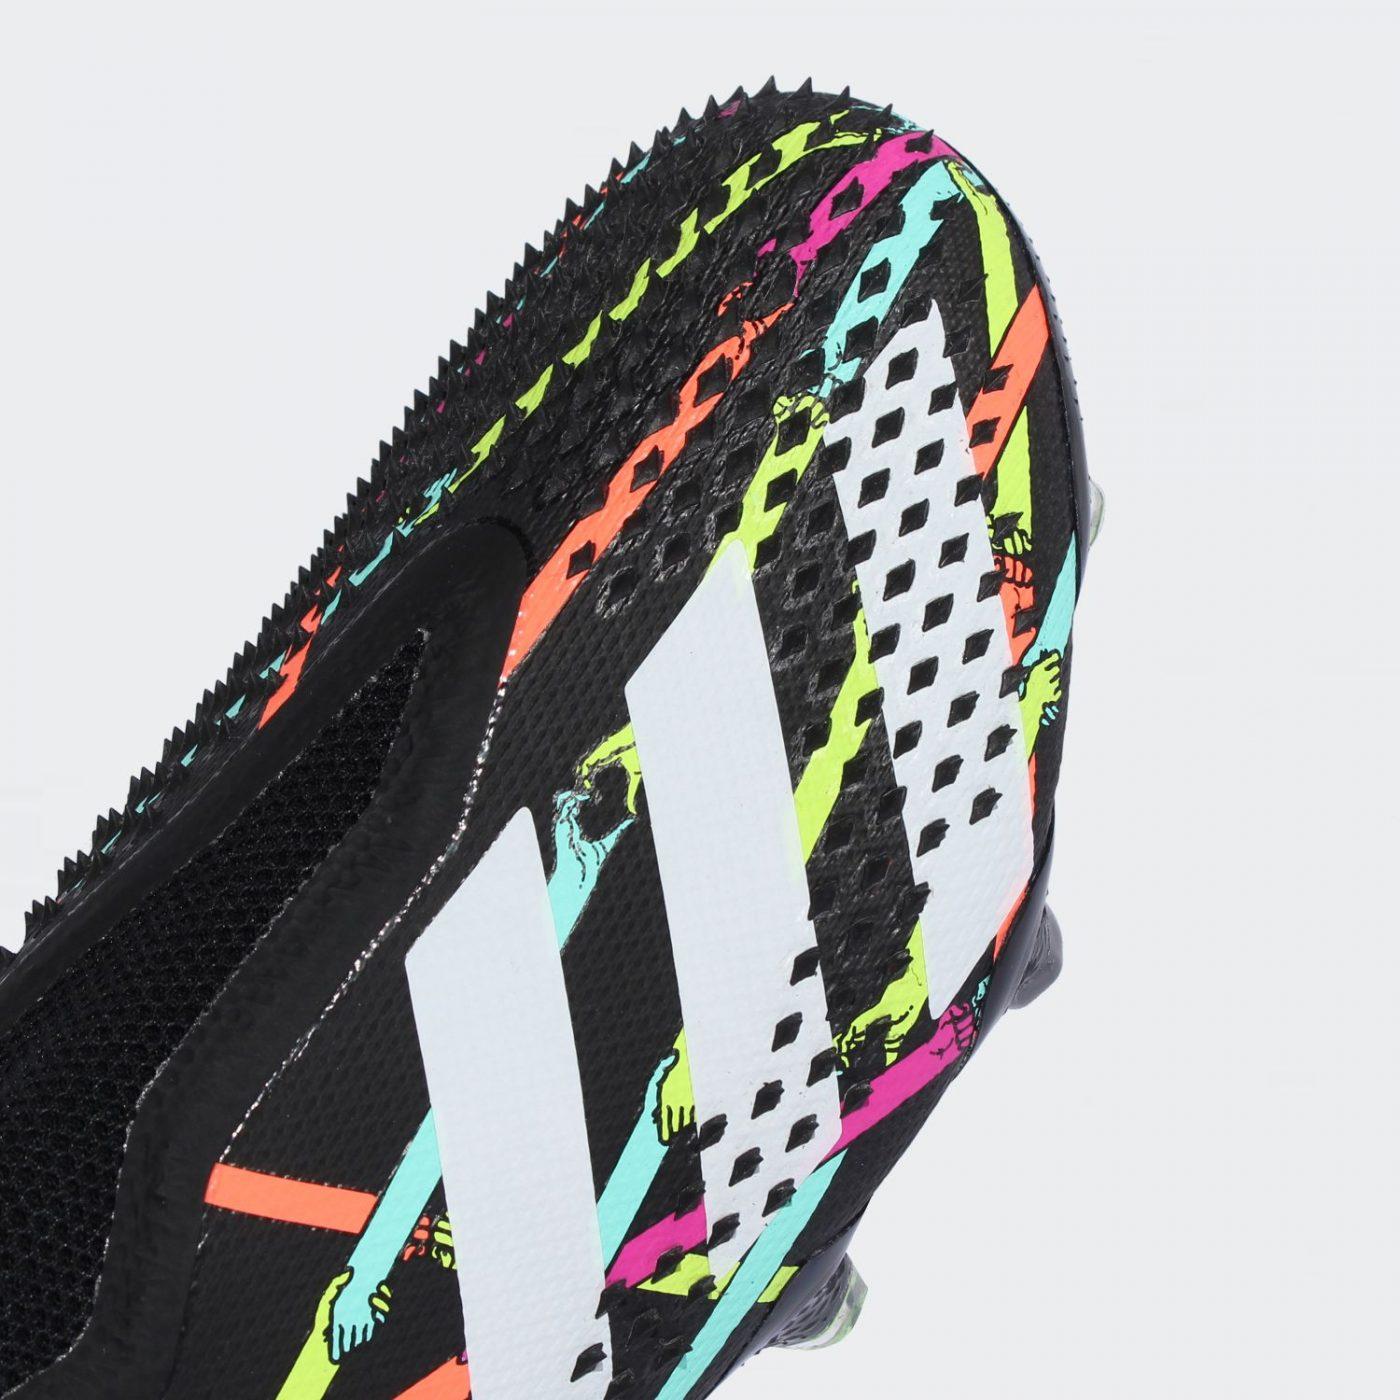 adidas-predator-20-mutator-art-firm-japon-5